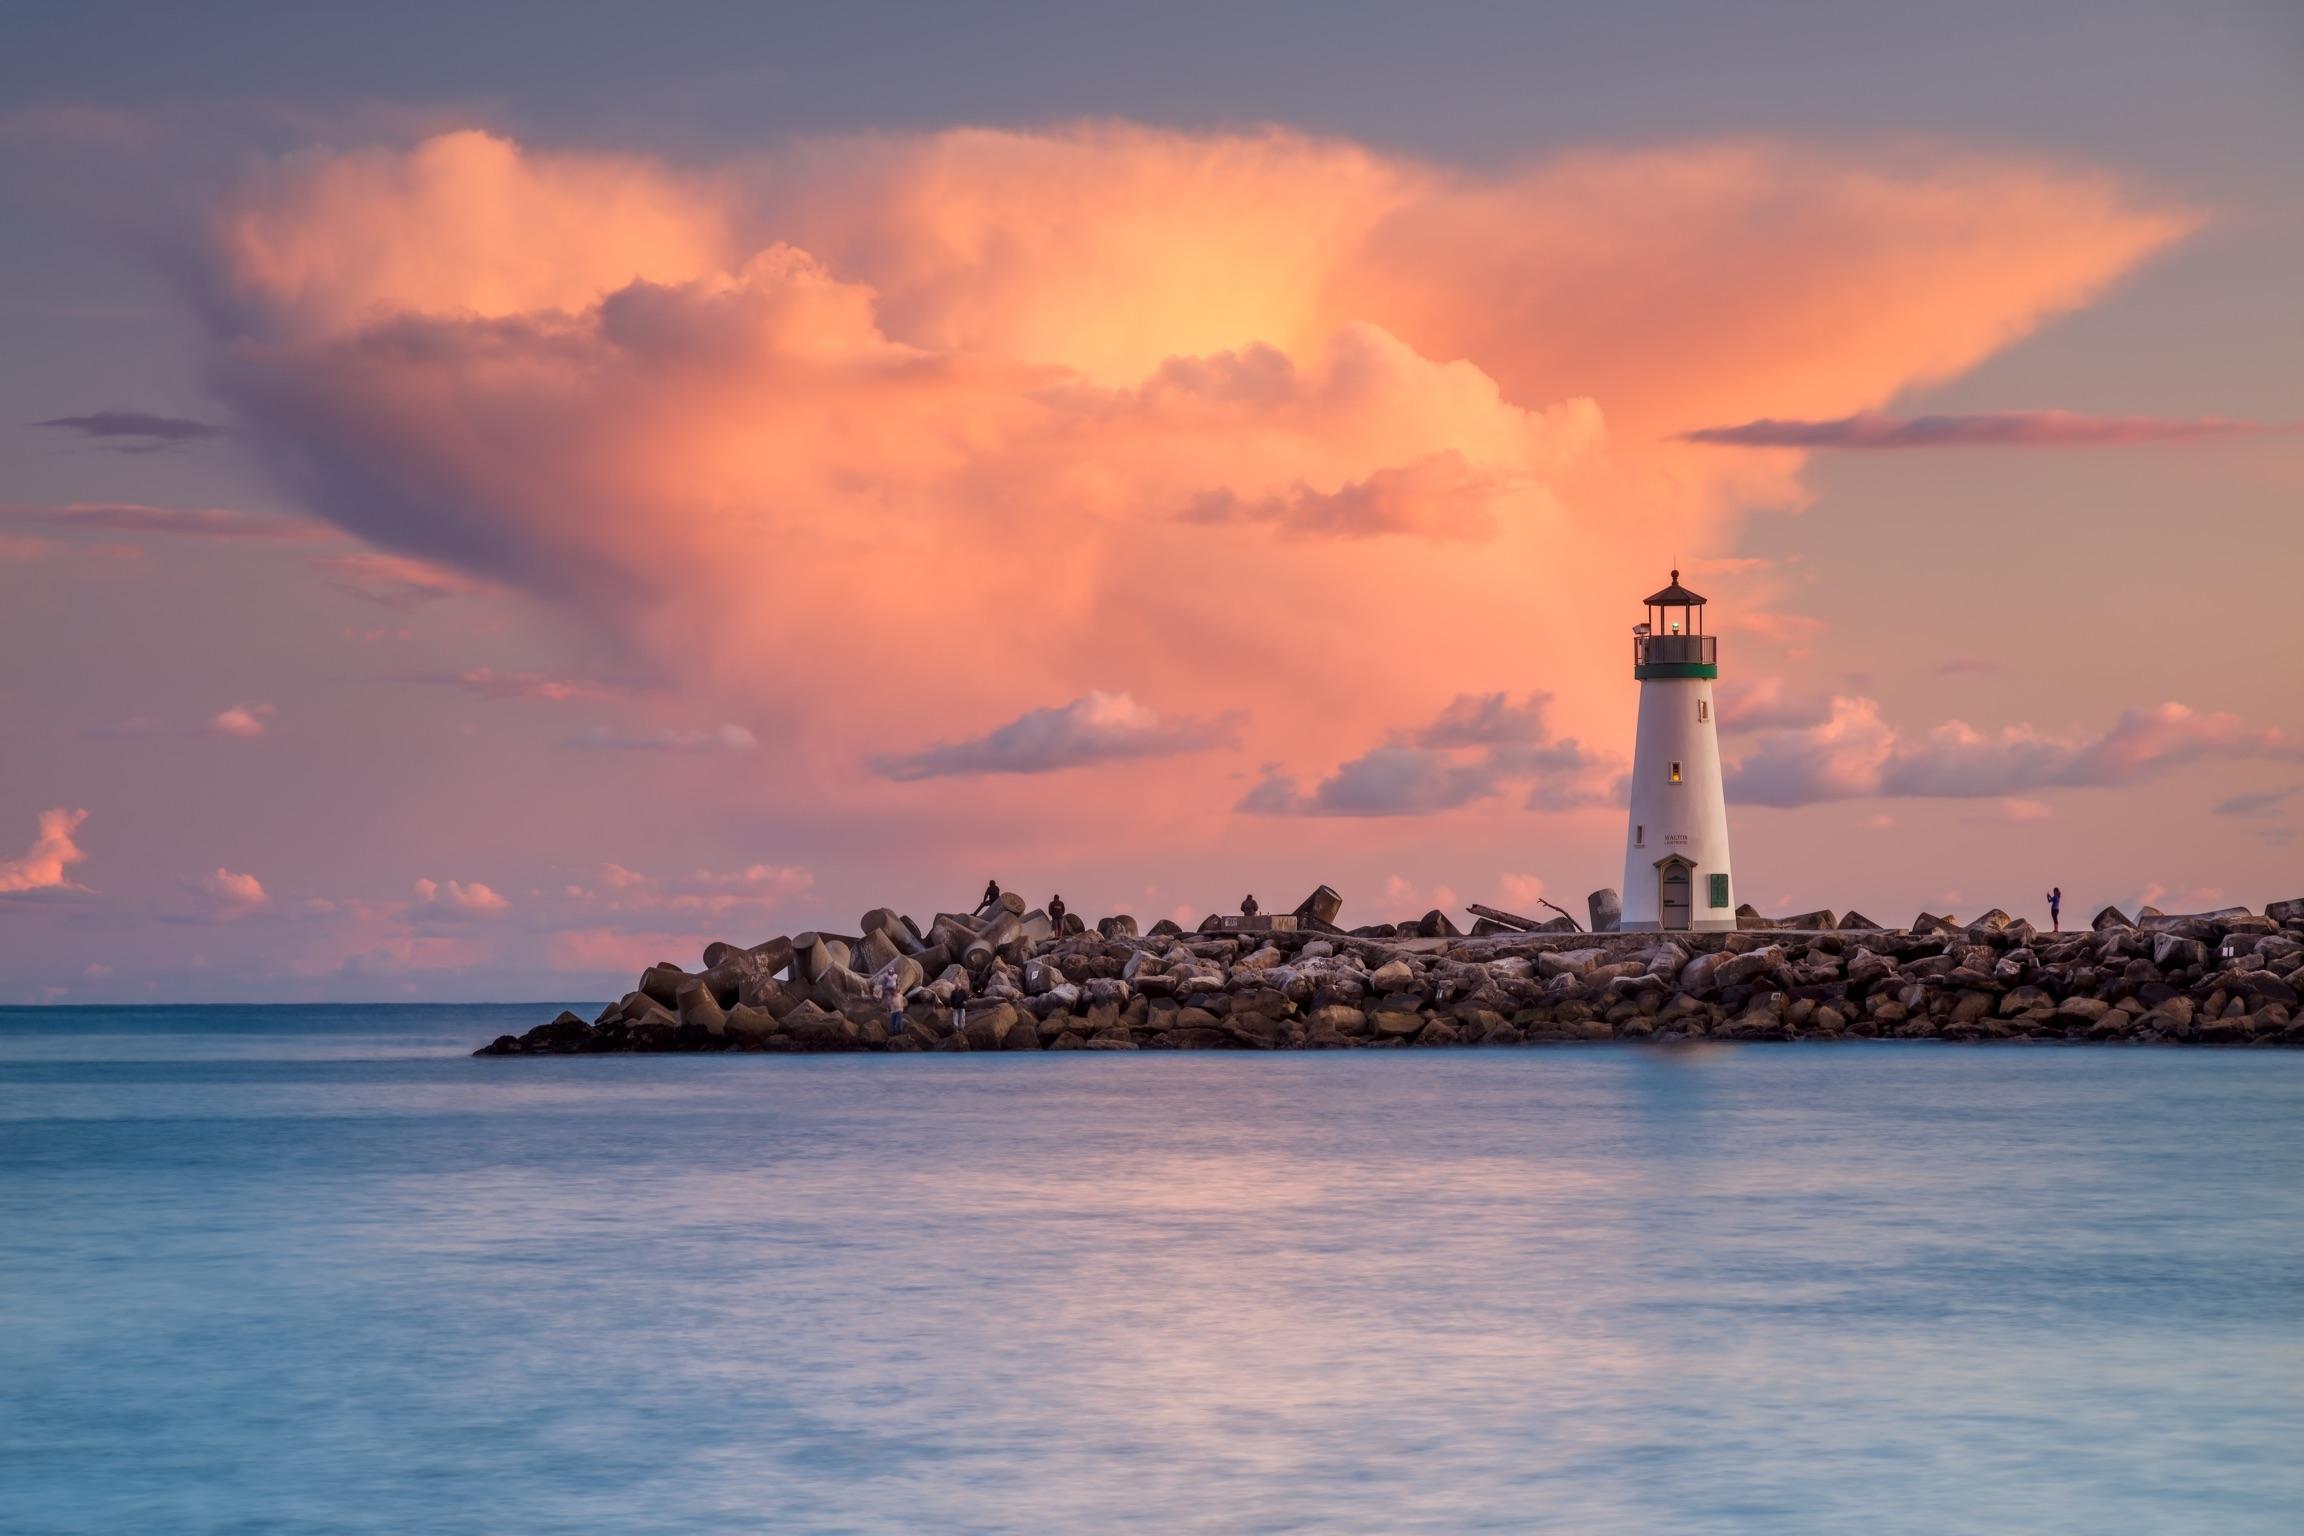 Pink clouds backdrop the Walton Lighthouse at the Santa Cruz Harbor.